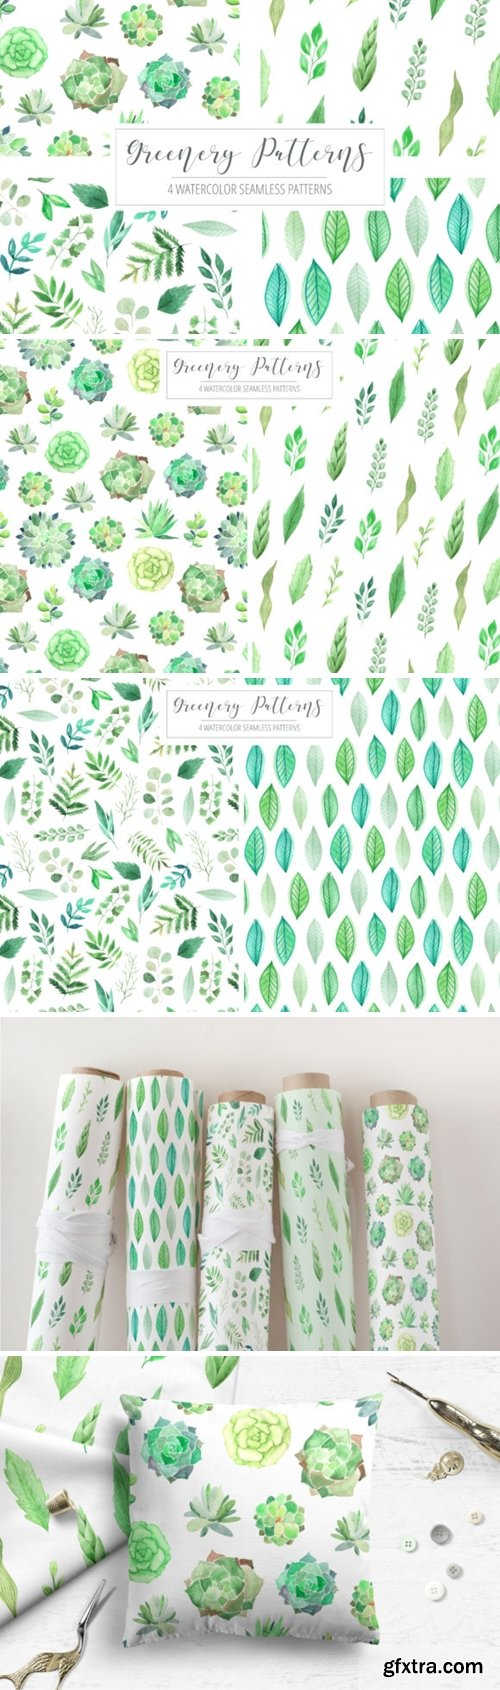 4 Watercolor Greenery Patterns 3515027